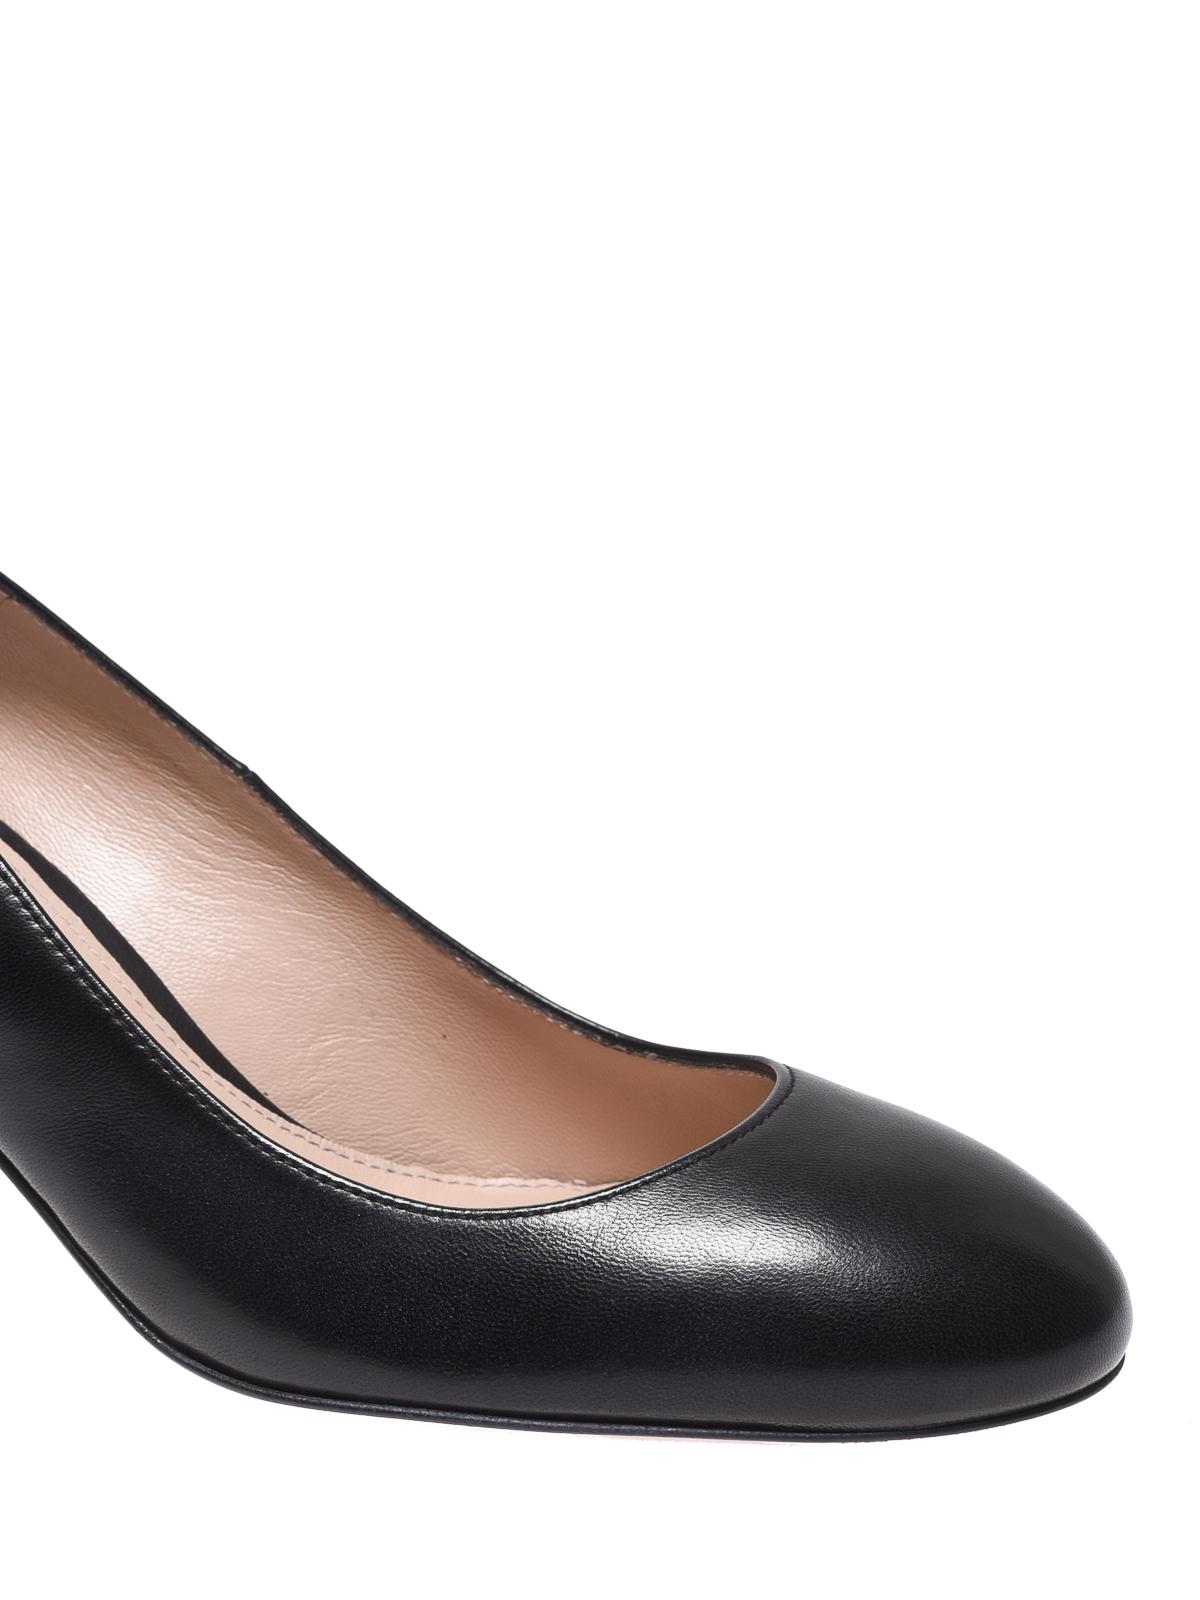 92130e0f107 iKRIX Stuart Weitzman  court shoes - Calf leather pumps with block heel